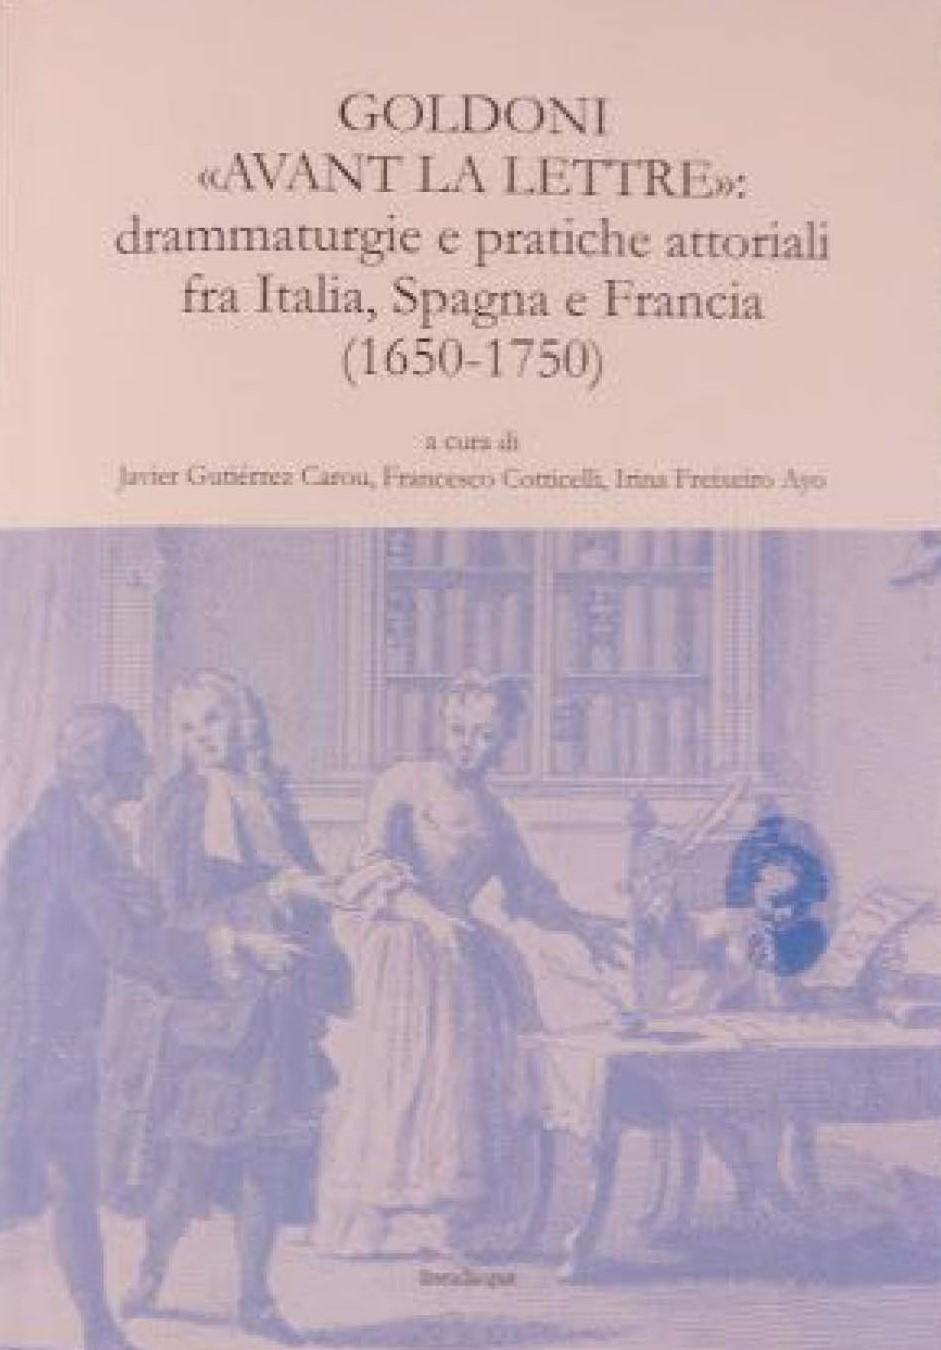 Goldoni « avant la lettre » : Drammaturgie e pratiche attoriali fra Italia, Spagna e Francia 1650-1750 (J. Goutiérrez Carou, F. Cotticelli, I. Freixeiro Ayo)